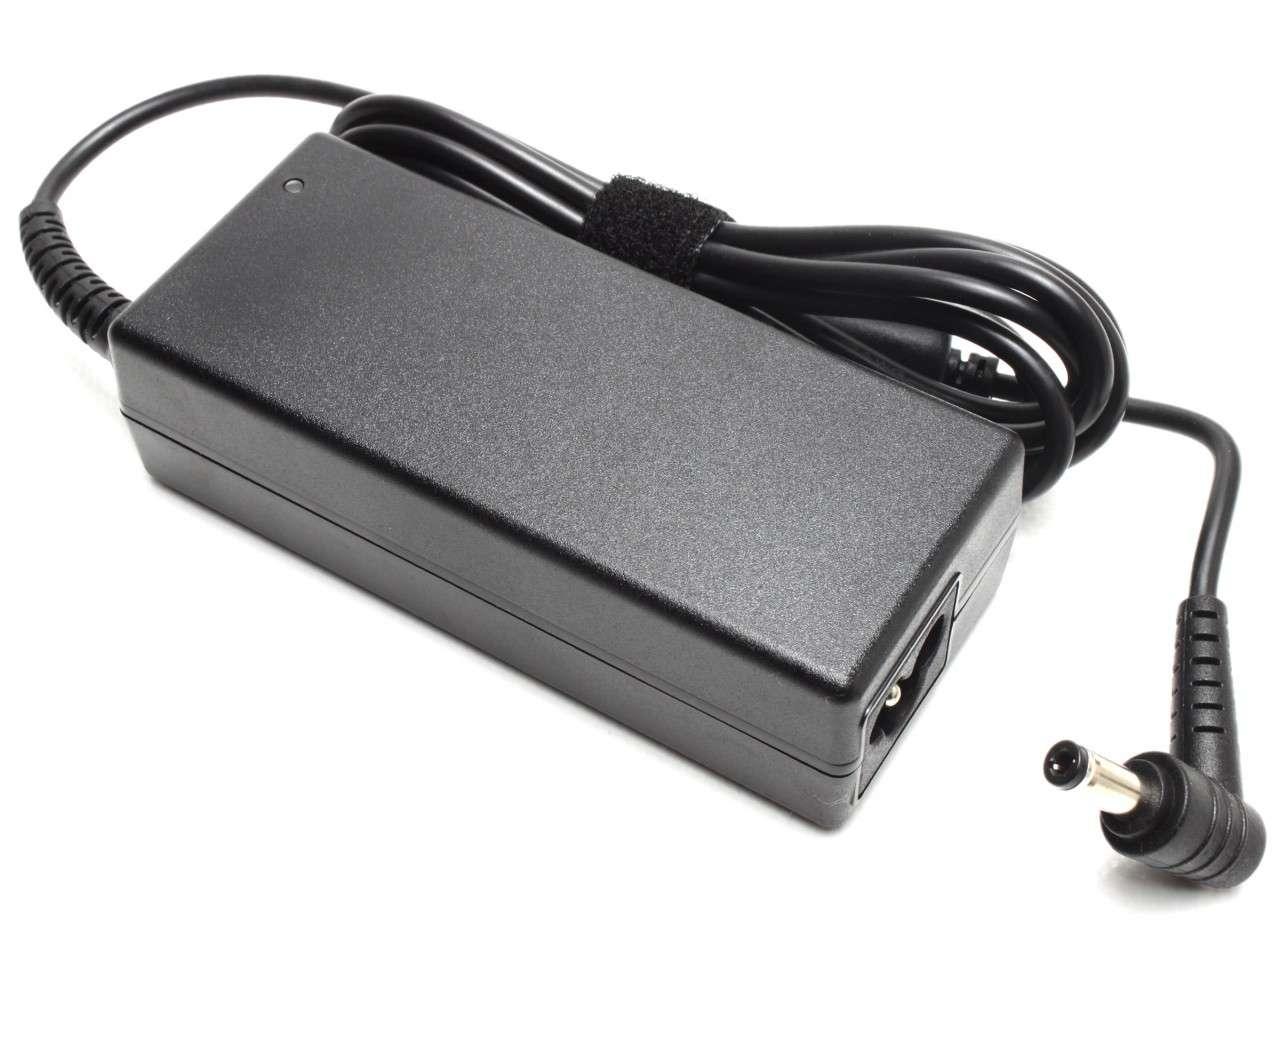 Incarcator Fujitsu Siemens LifeBook PH530 imagine powerlaptop.ro 2021